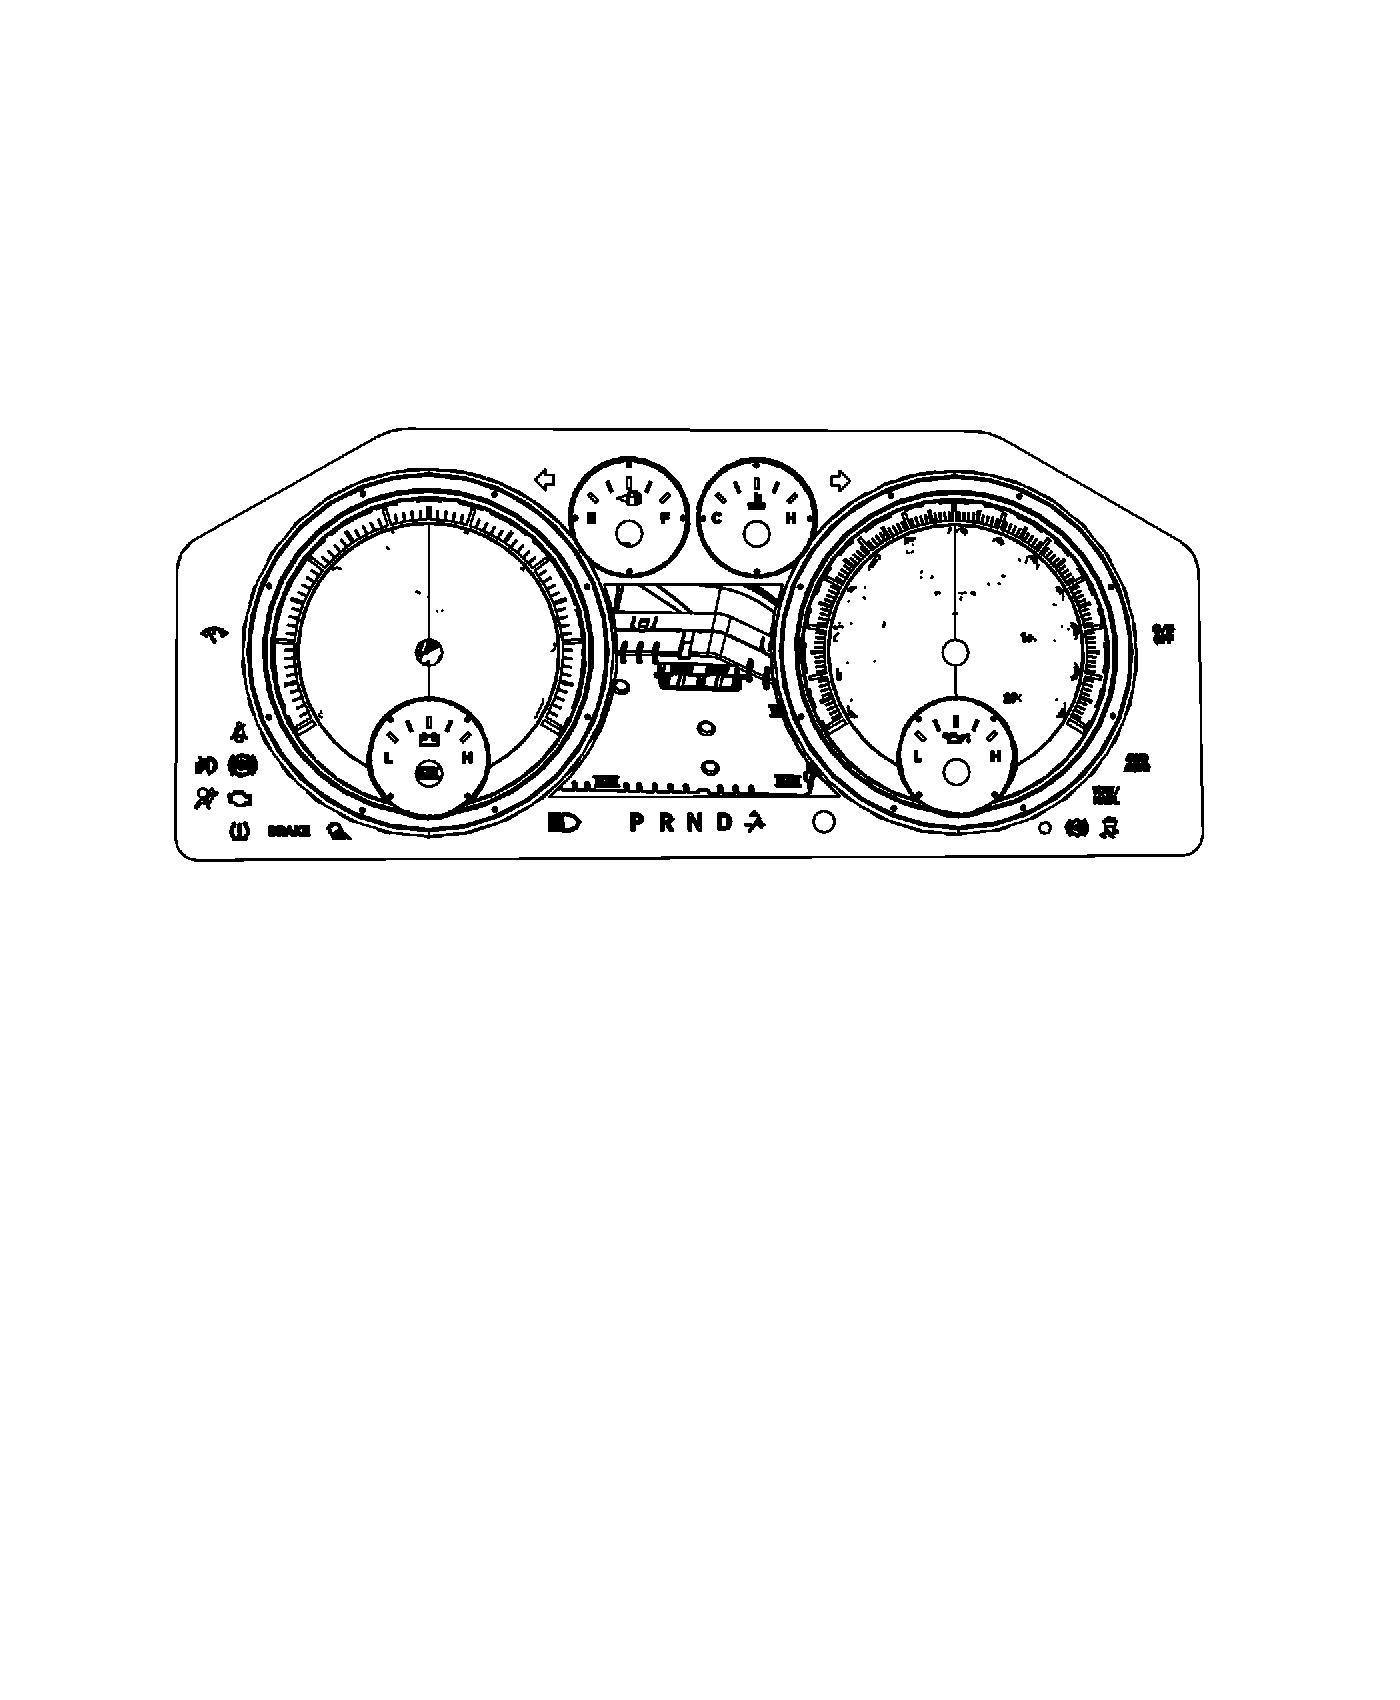 Ram 2500 Cluster. Instrument panel. [laramie longhorn